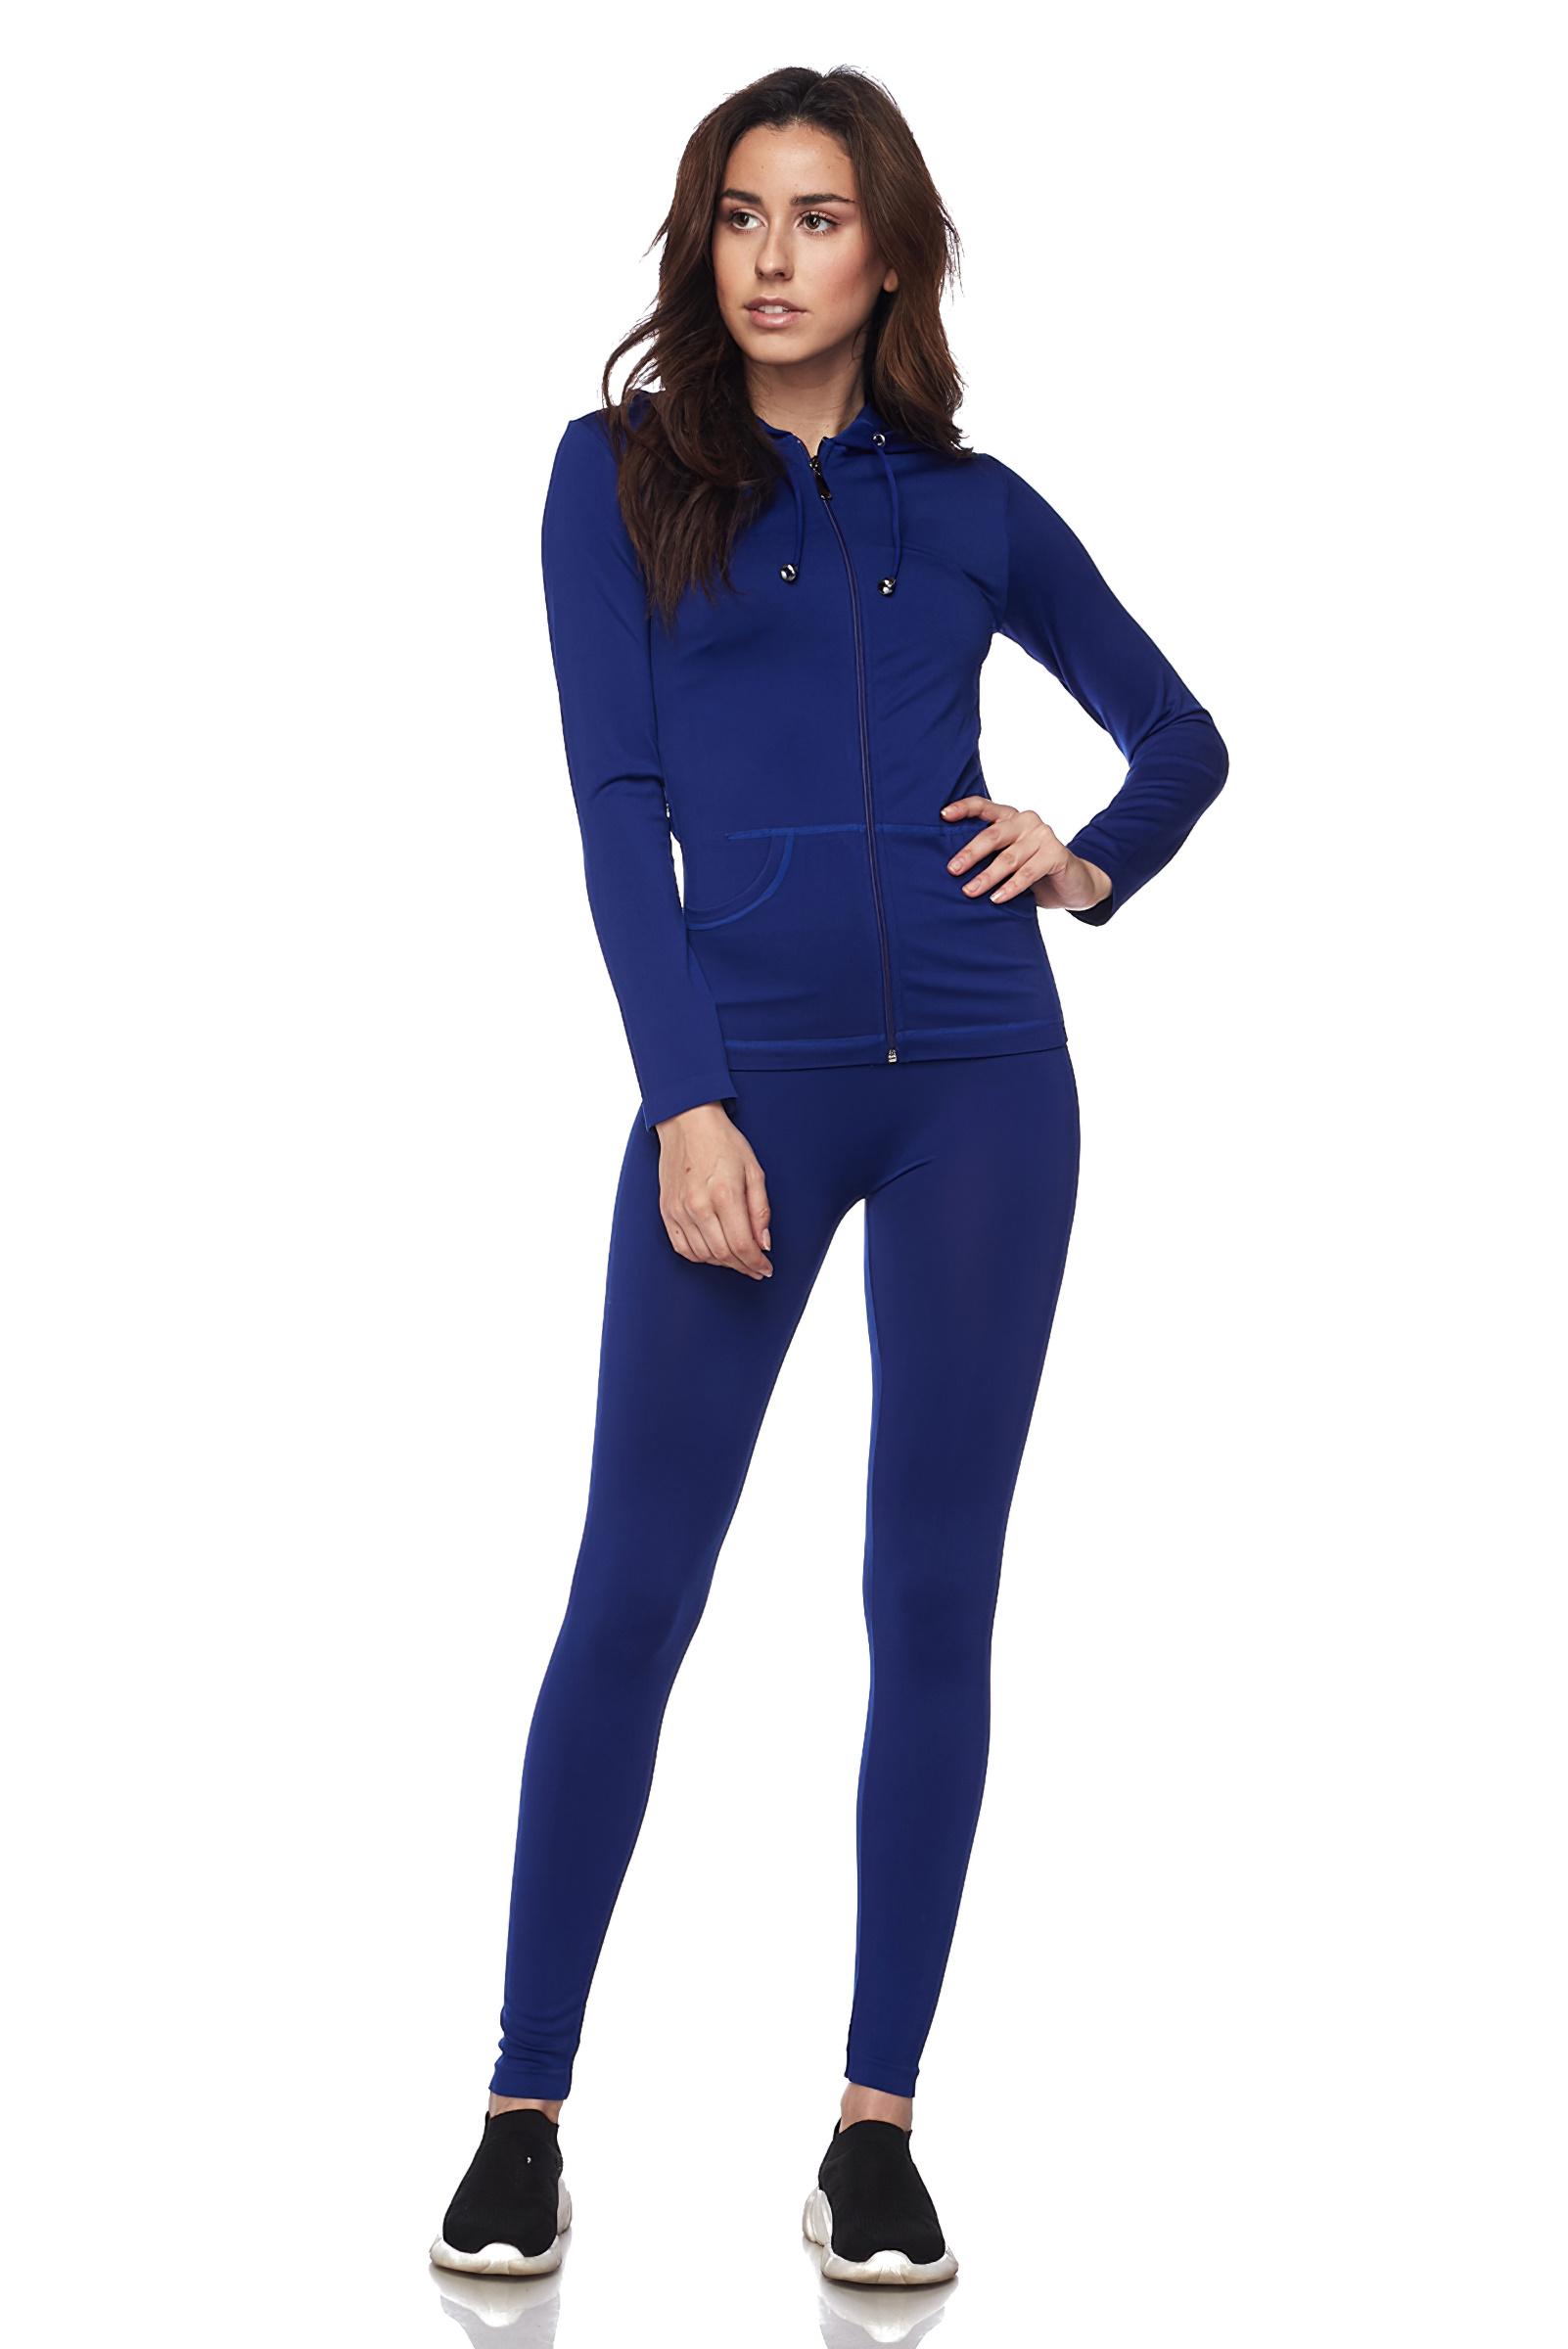 Women-039-s-Juniors-Active-Set-Wear-Zip-Up-Hoodie-and-Legging thumbnail 44